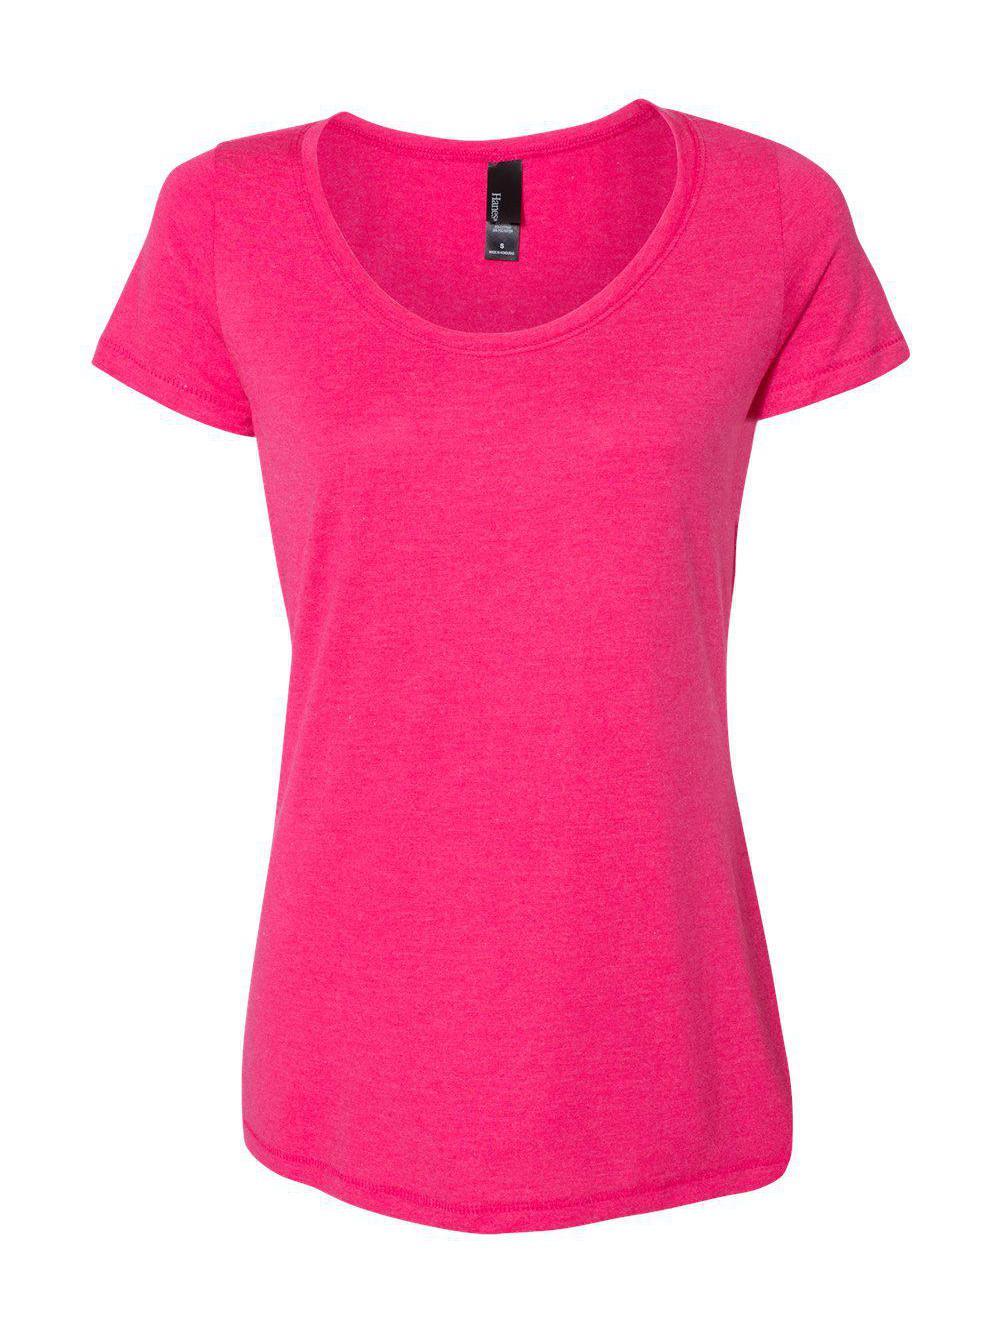 Hanes-Women-039-s-Modal-Triblend-T-Shirt-MO150 thumbnail 10